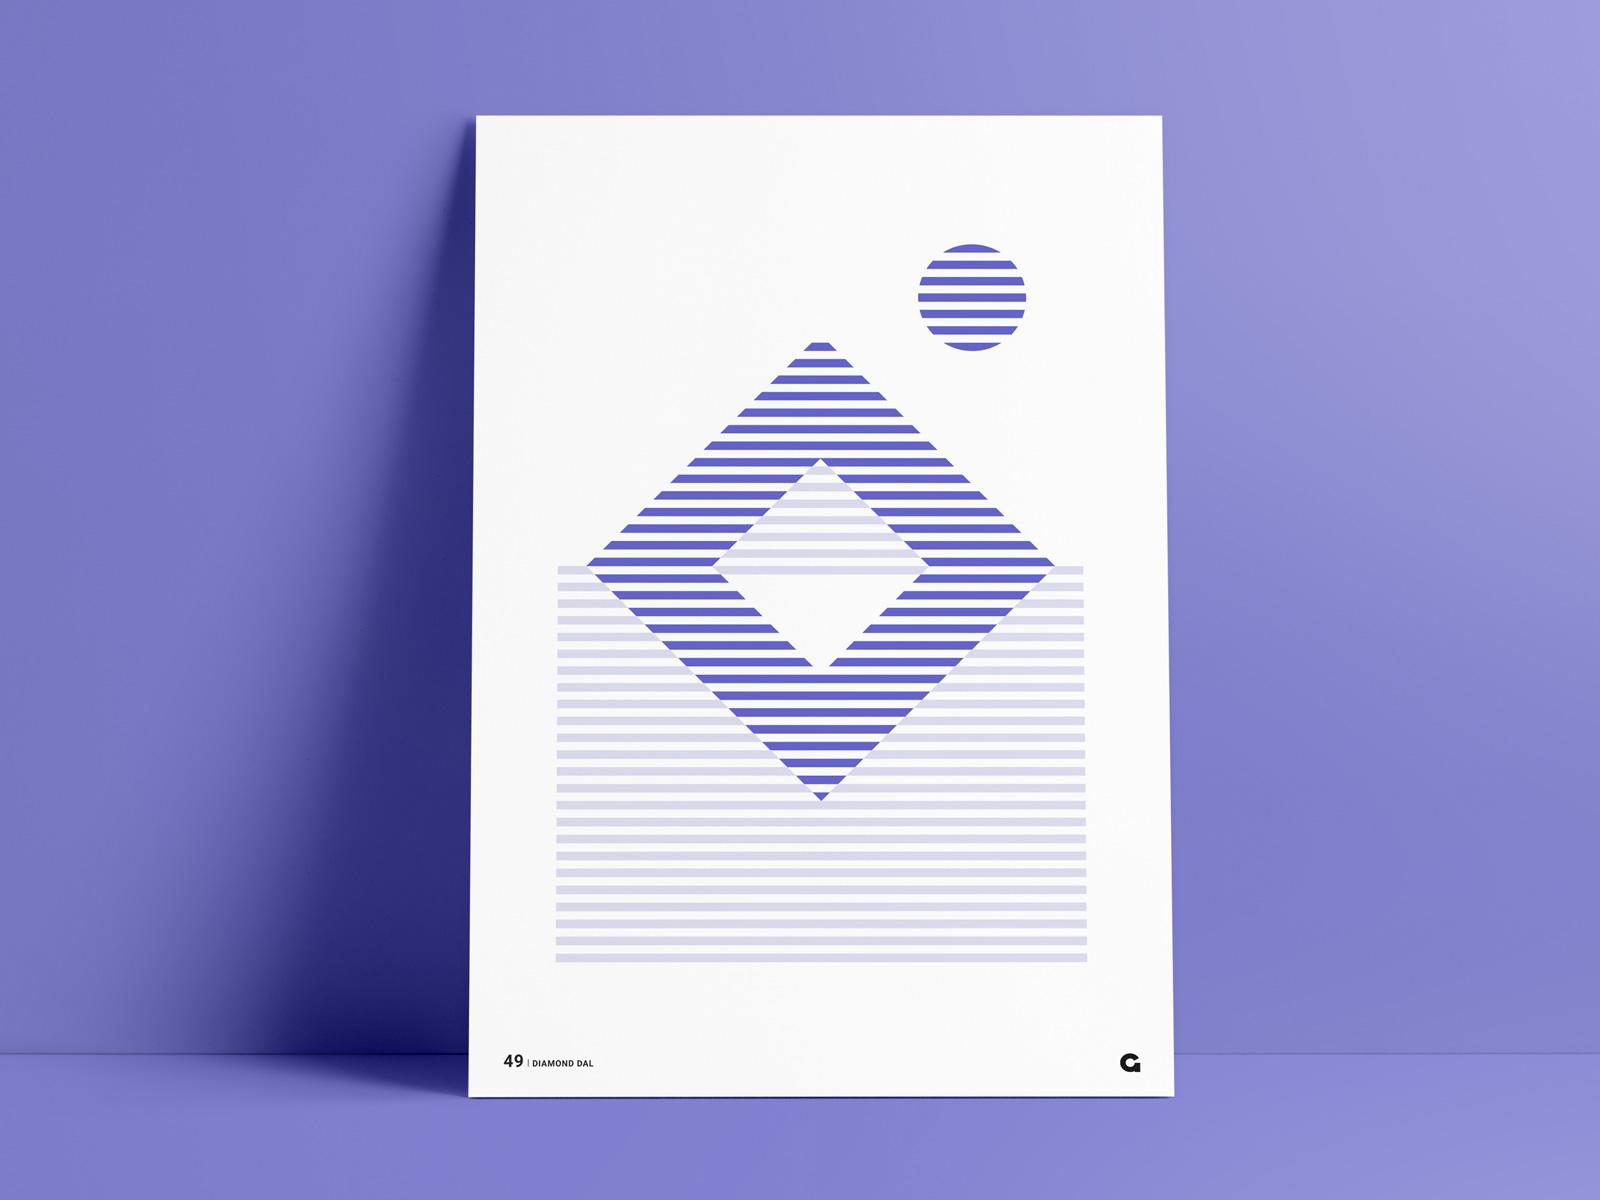 poster49-inverted-diamond.jpg